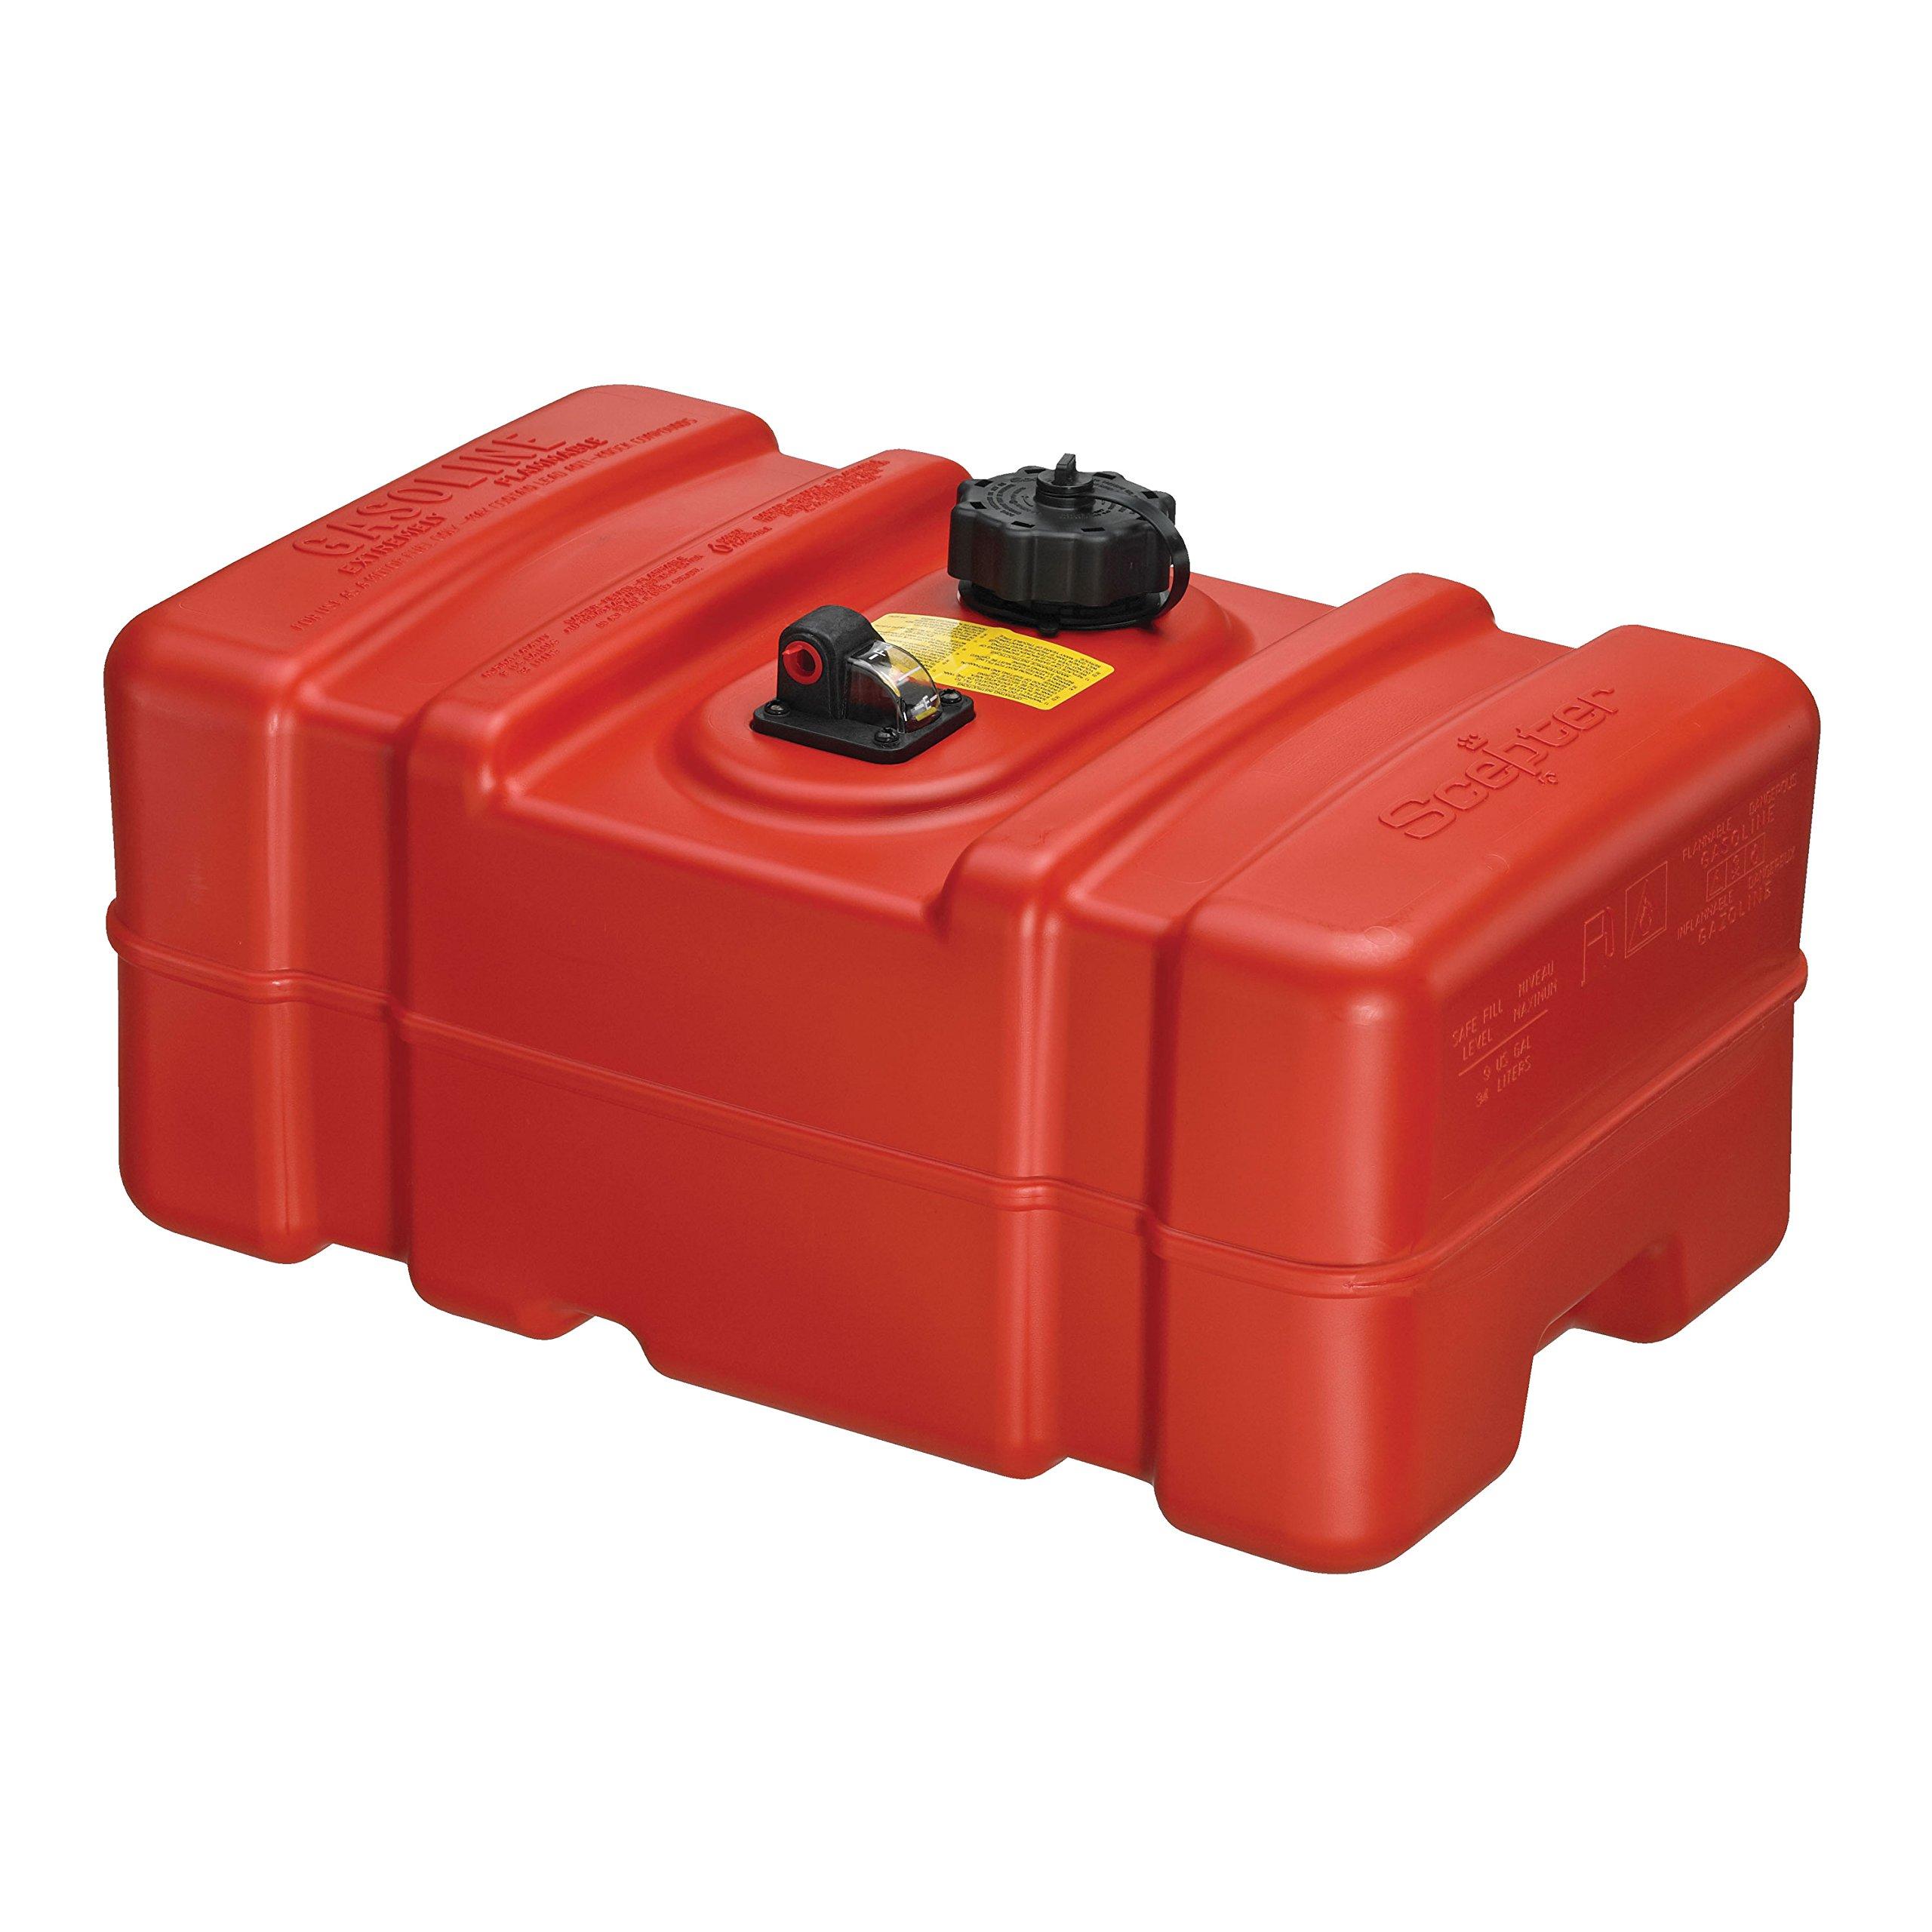 Scepter 08667 Rectangular Fuel Tank - 9 Gallon